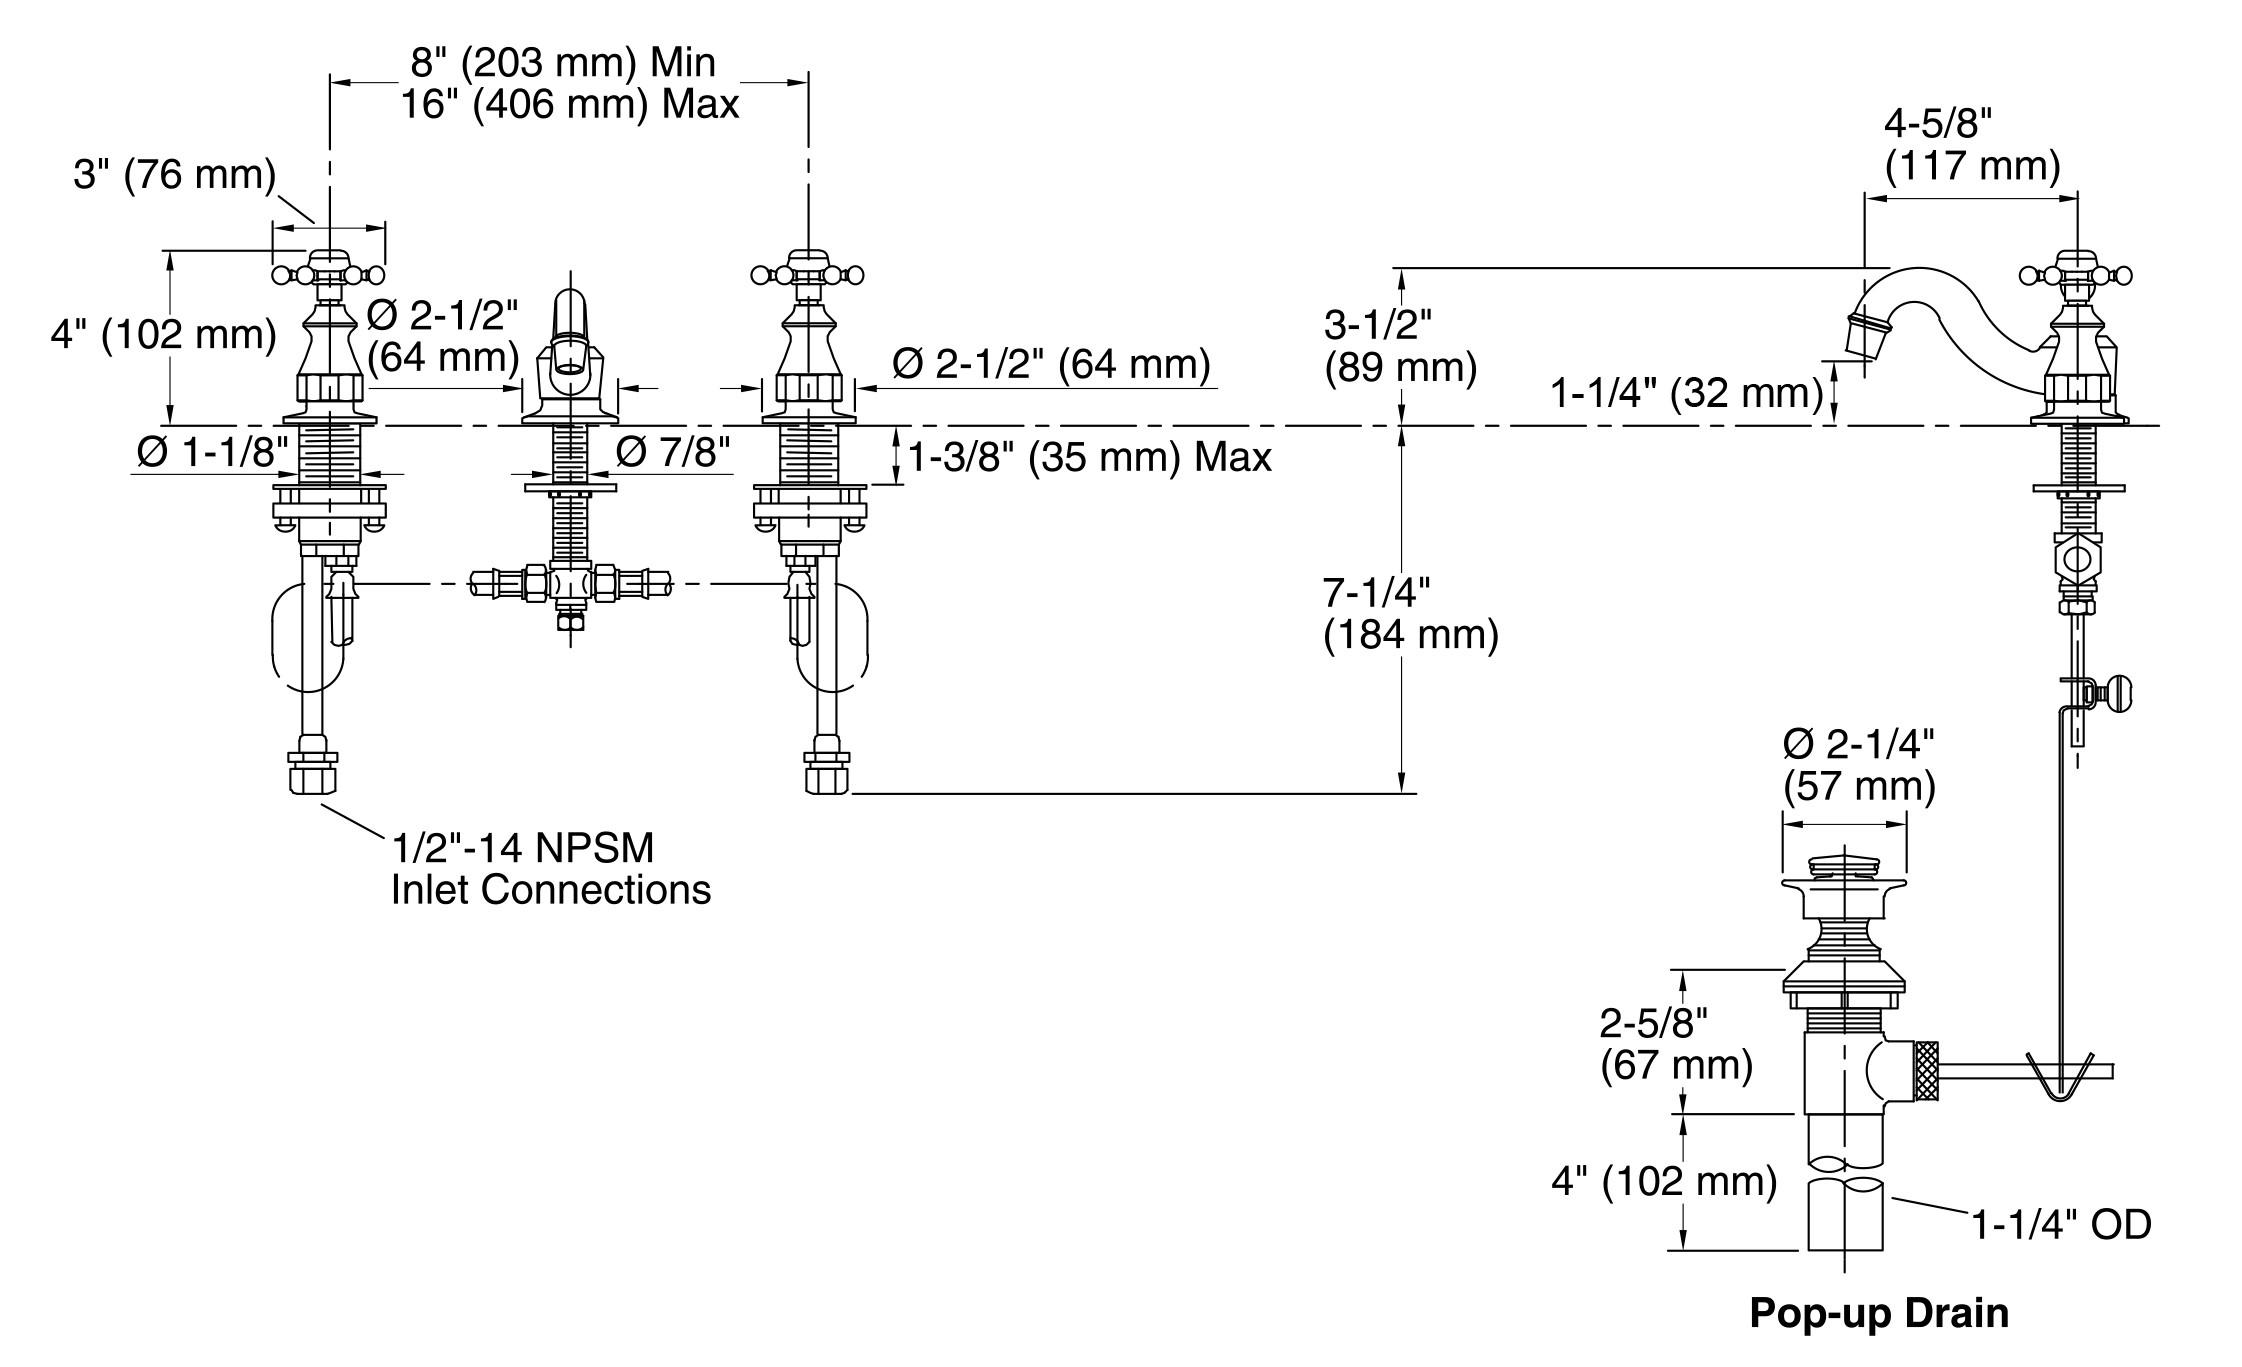 Delta Shower Parts Diagram Tips & Ideas Outstanding Kohler Faucet Parts for Remarkable Repair Of Delta Shower Parts Diagram